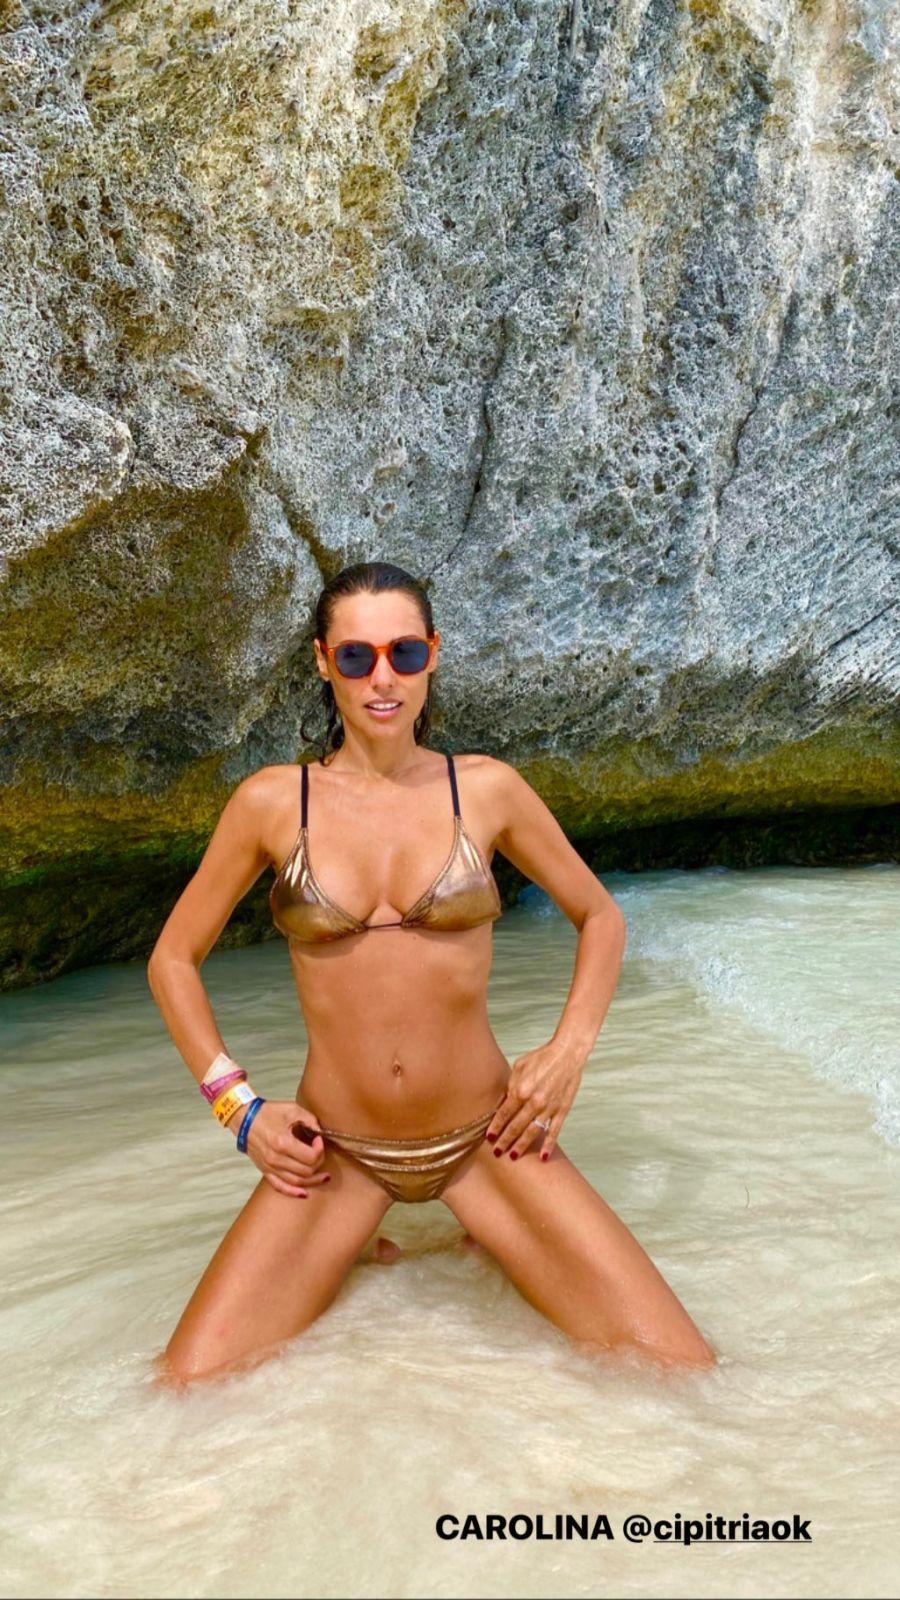 Infernal: Pampita rompió la web con sus fotos en bikini metalizada